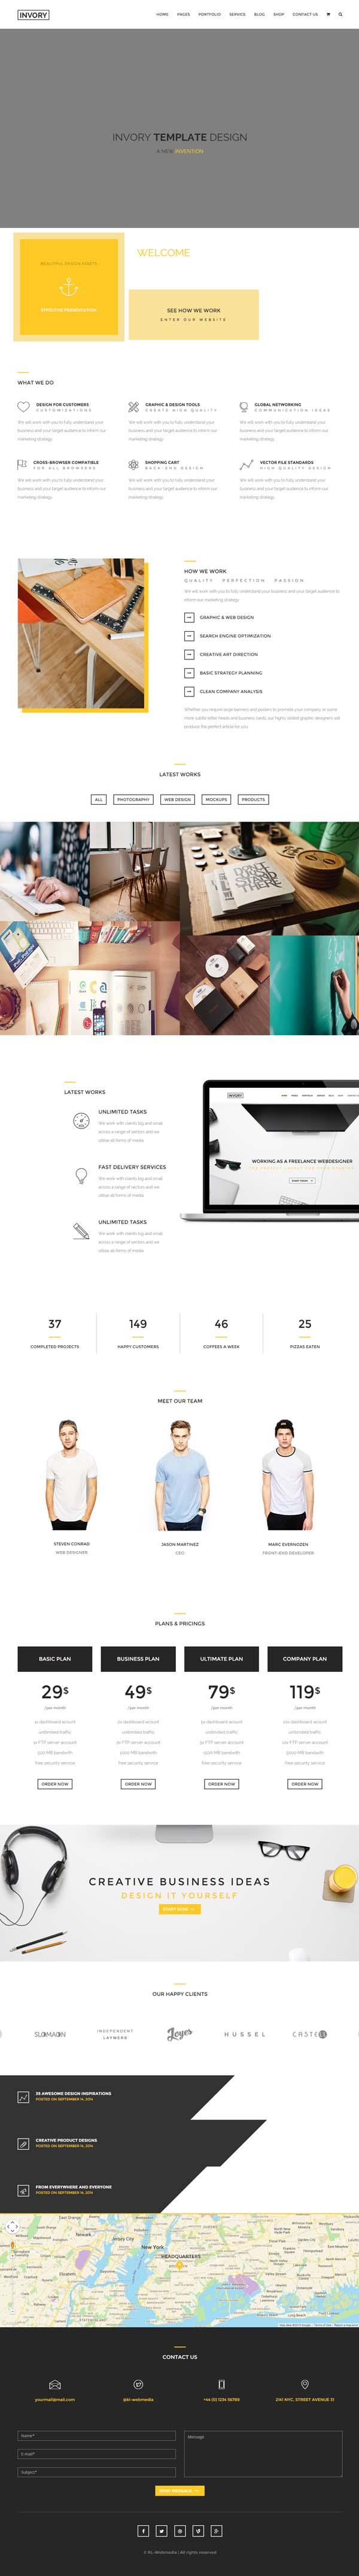 Invory - Multi-Purpose HTML5 Template